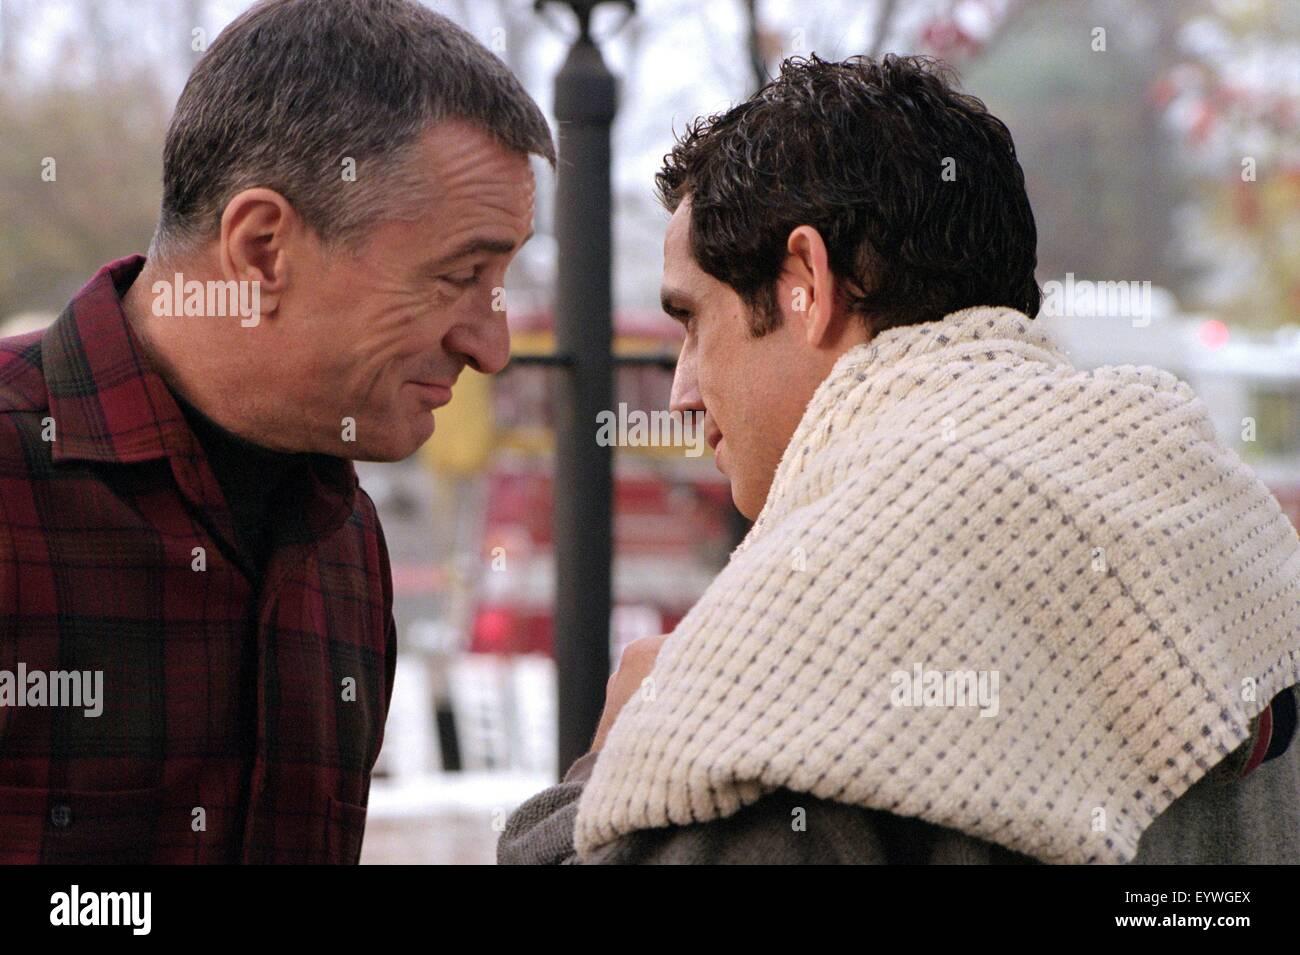 Meet the Parents ; Year : 2000 USA ; Director : Jay Roach ; Ben Stiller, Robert De Niro ; Photo: Phillip V. Caruso - Stock Image